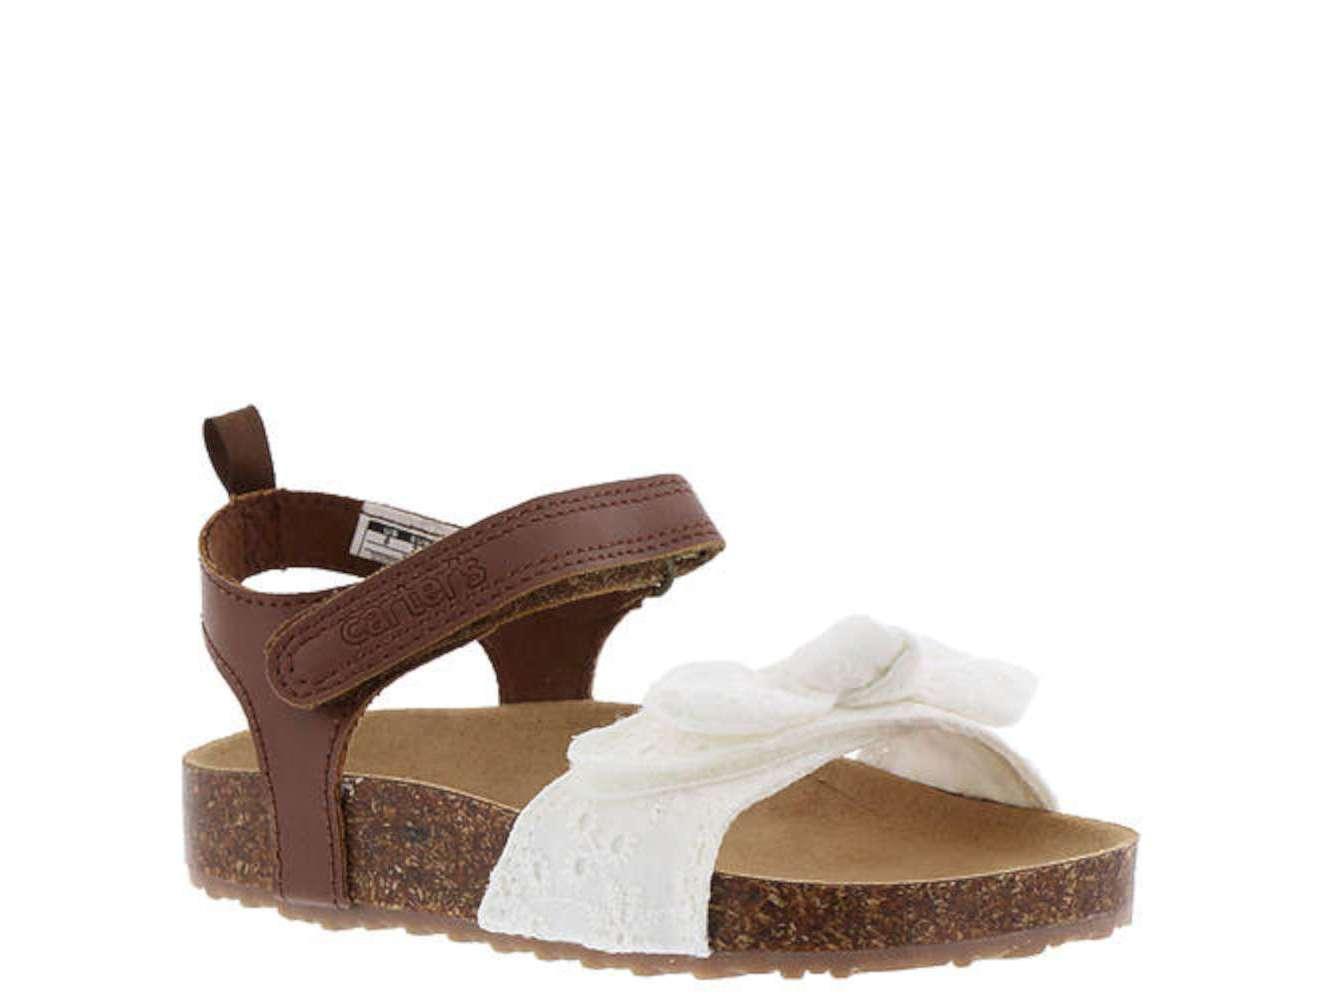 Carter/'s Toddler Girl/'s Welsie Sandals Shoes